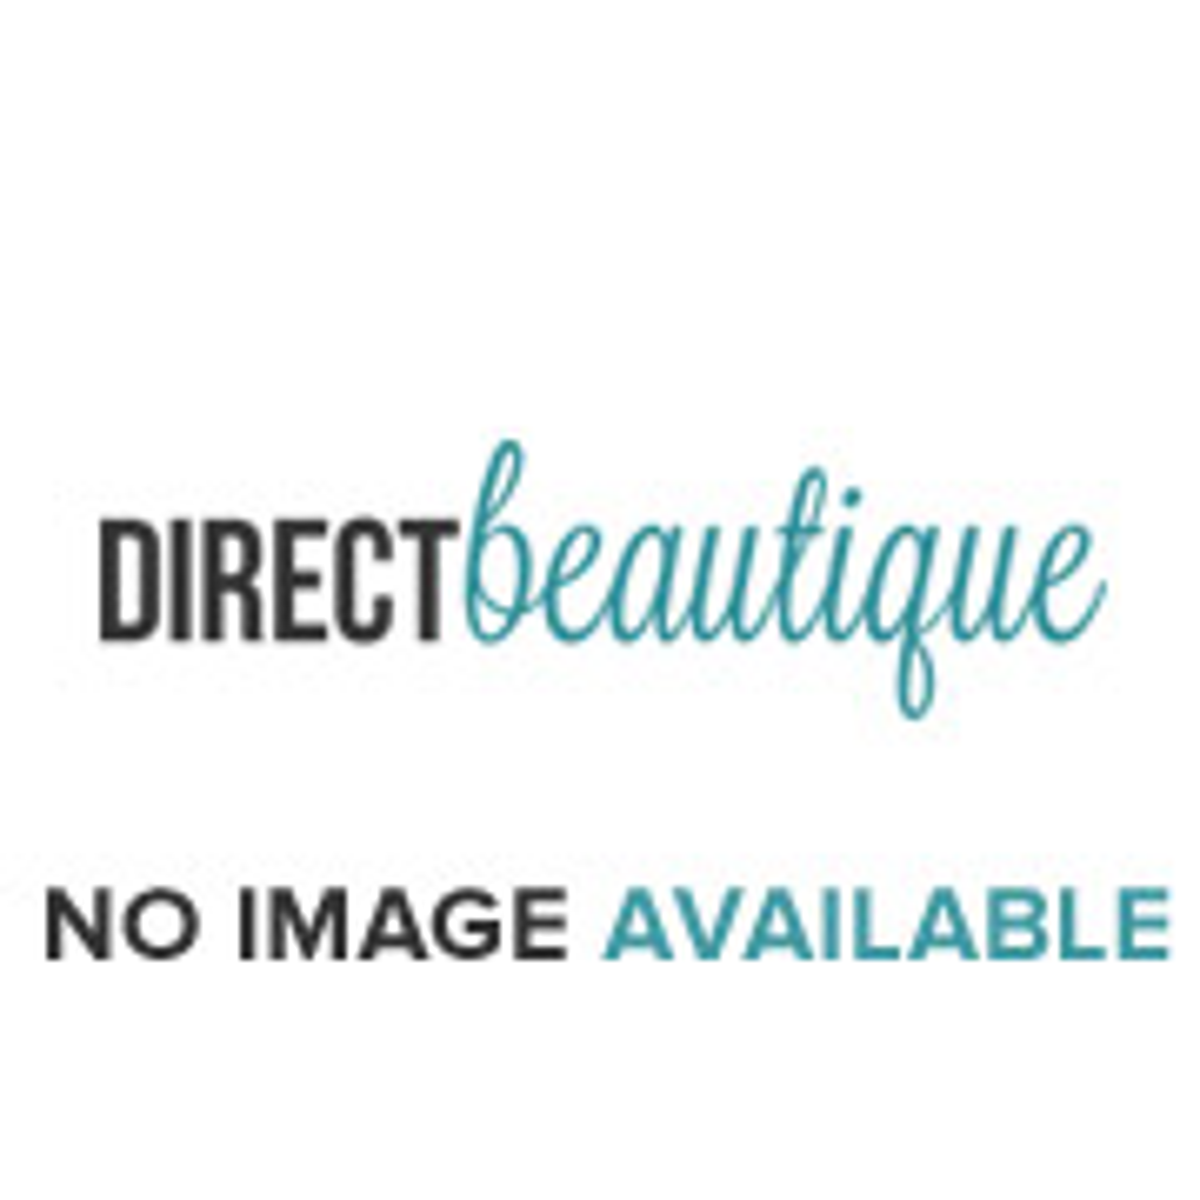 Halston Z Aftershave Lotion 125ml Splash